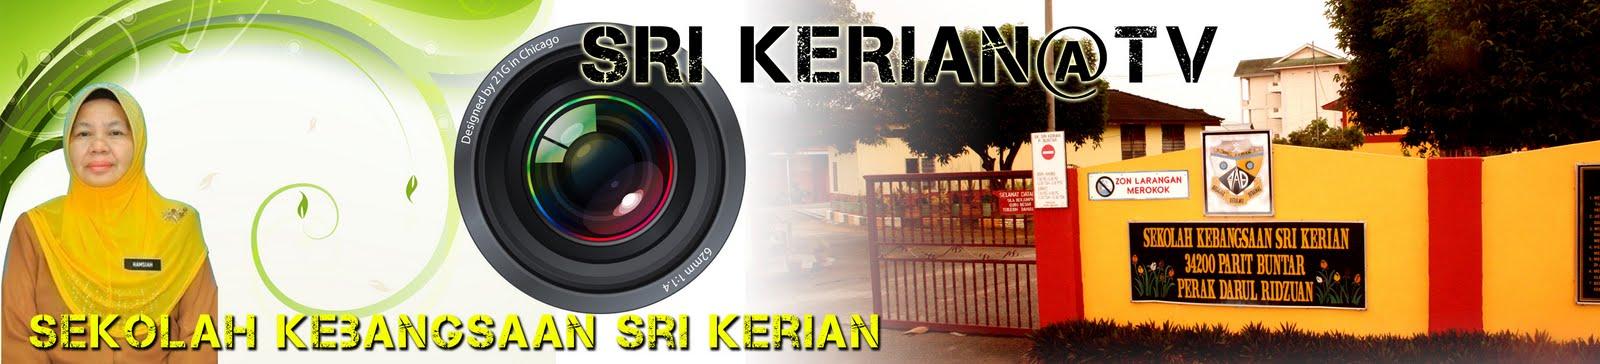 SRI KERIAN.COM